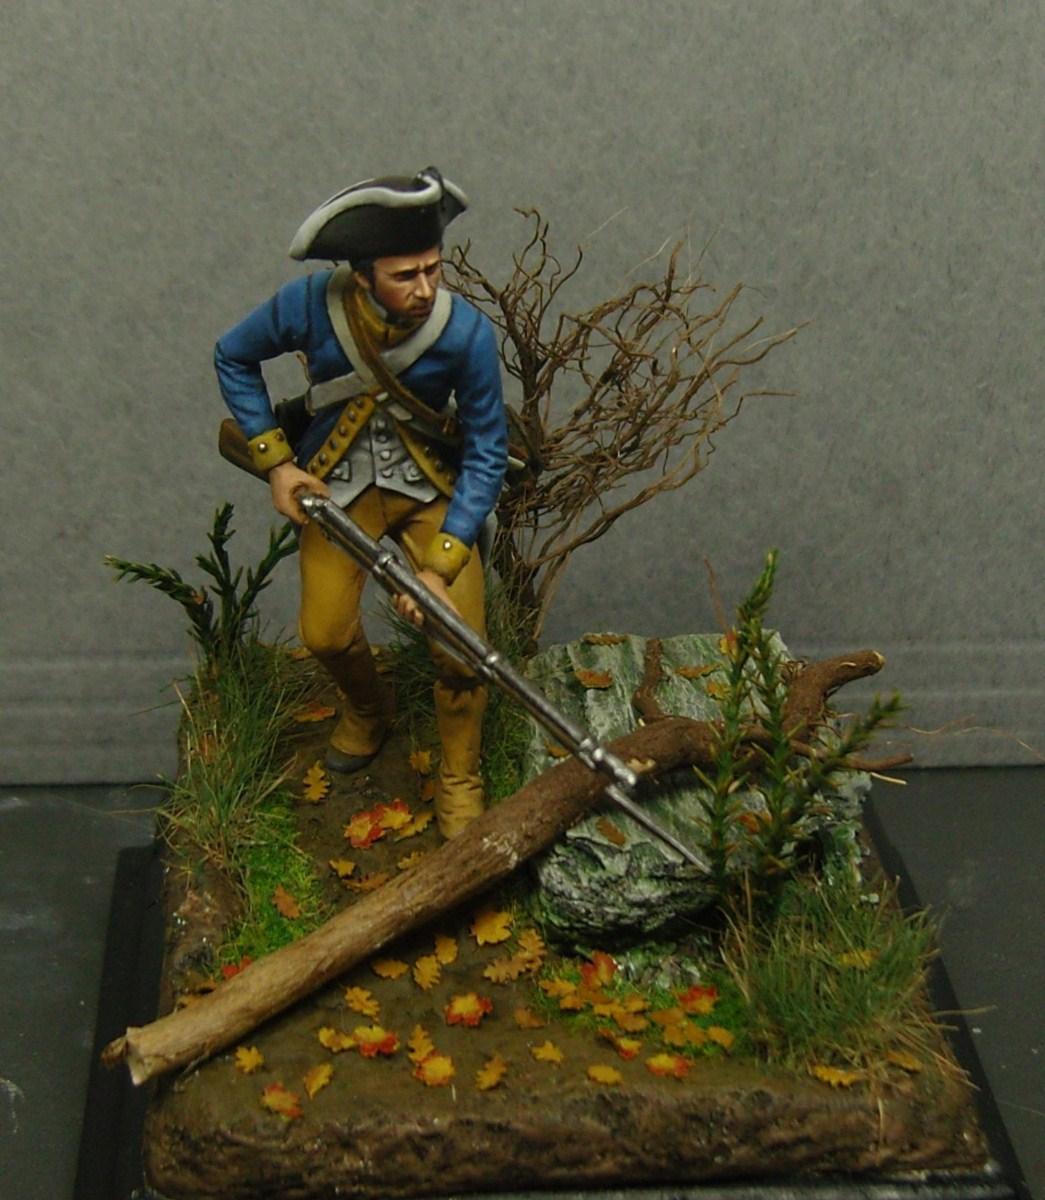 US Revolutionary Infantryman, 1780 - Page 7 120304052735699799532445